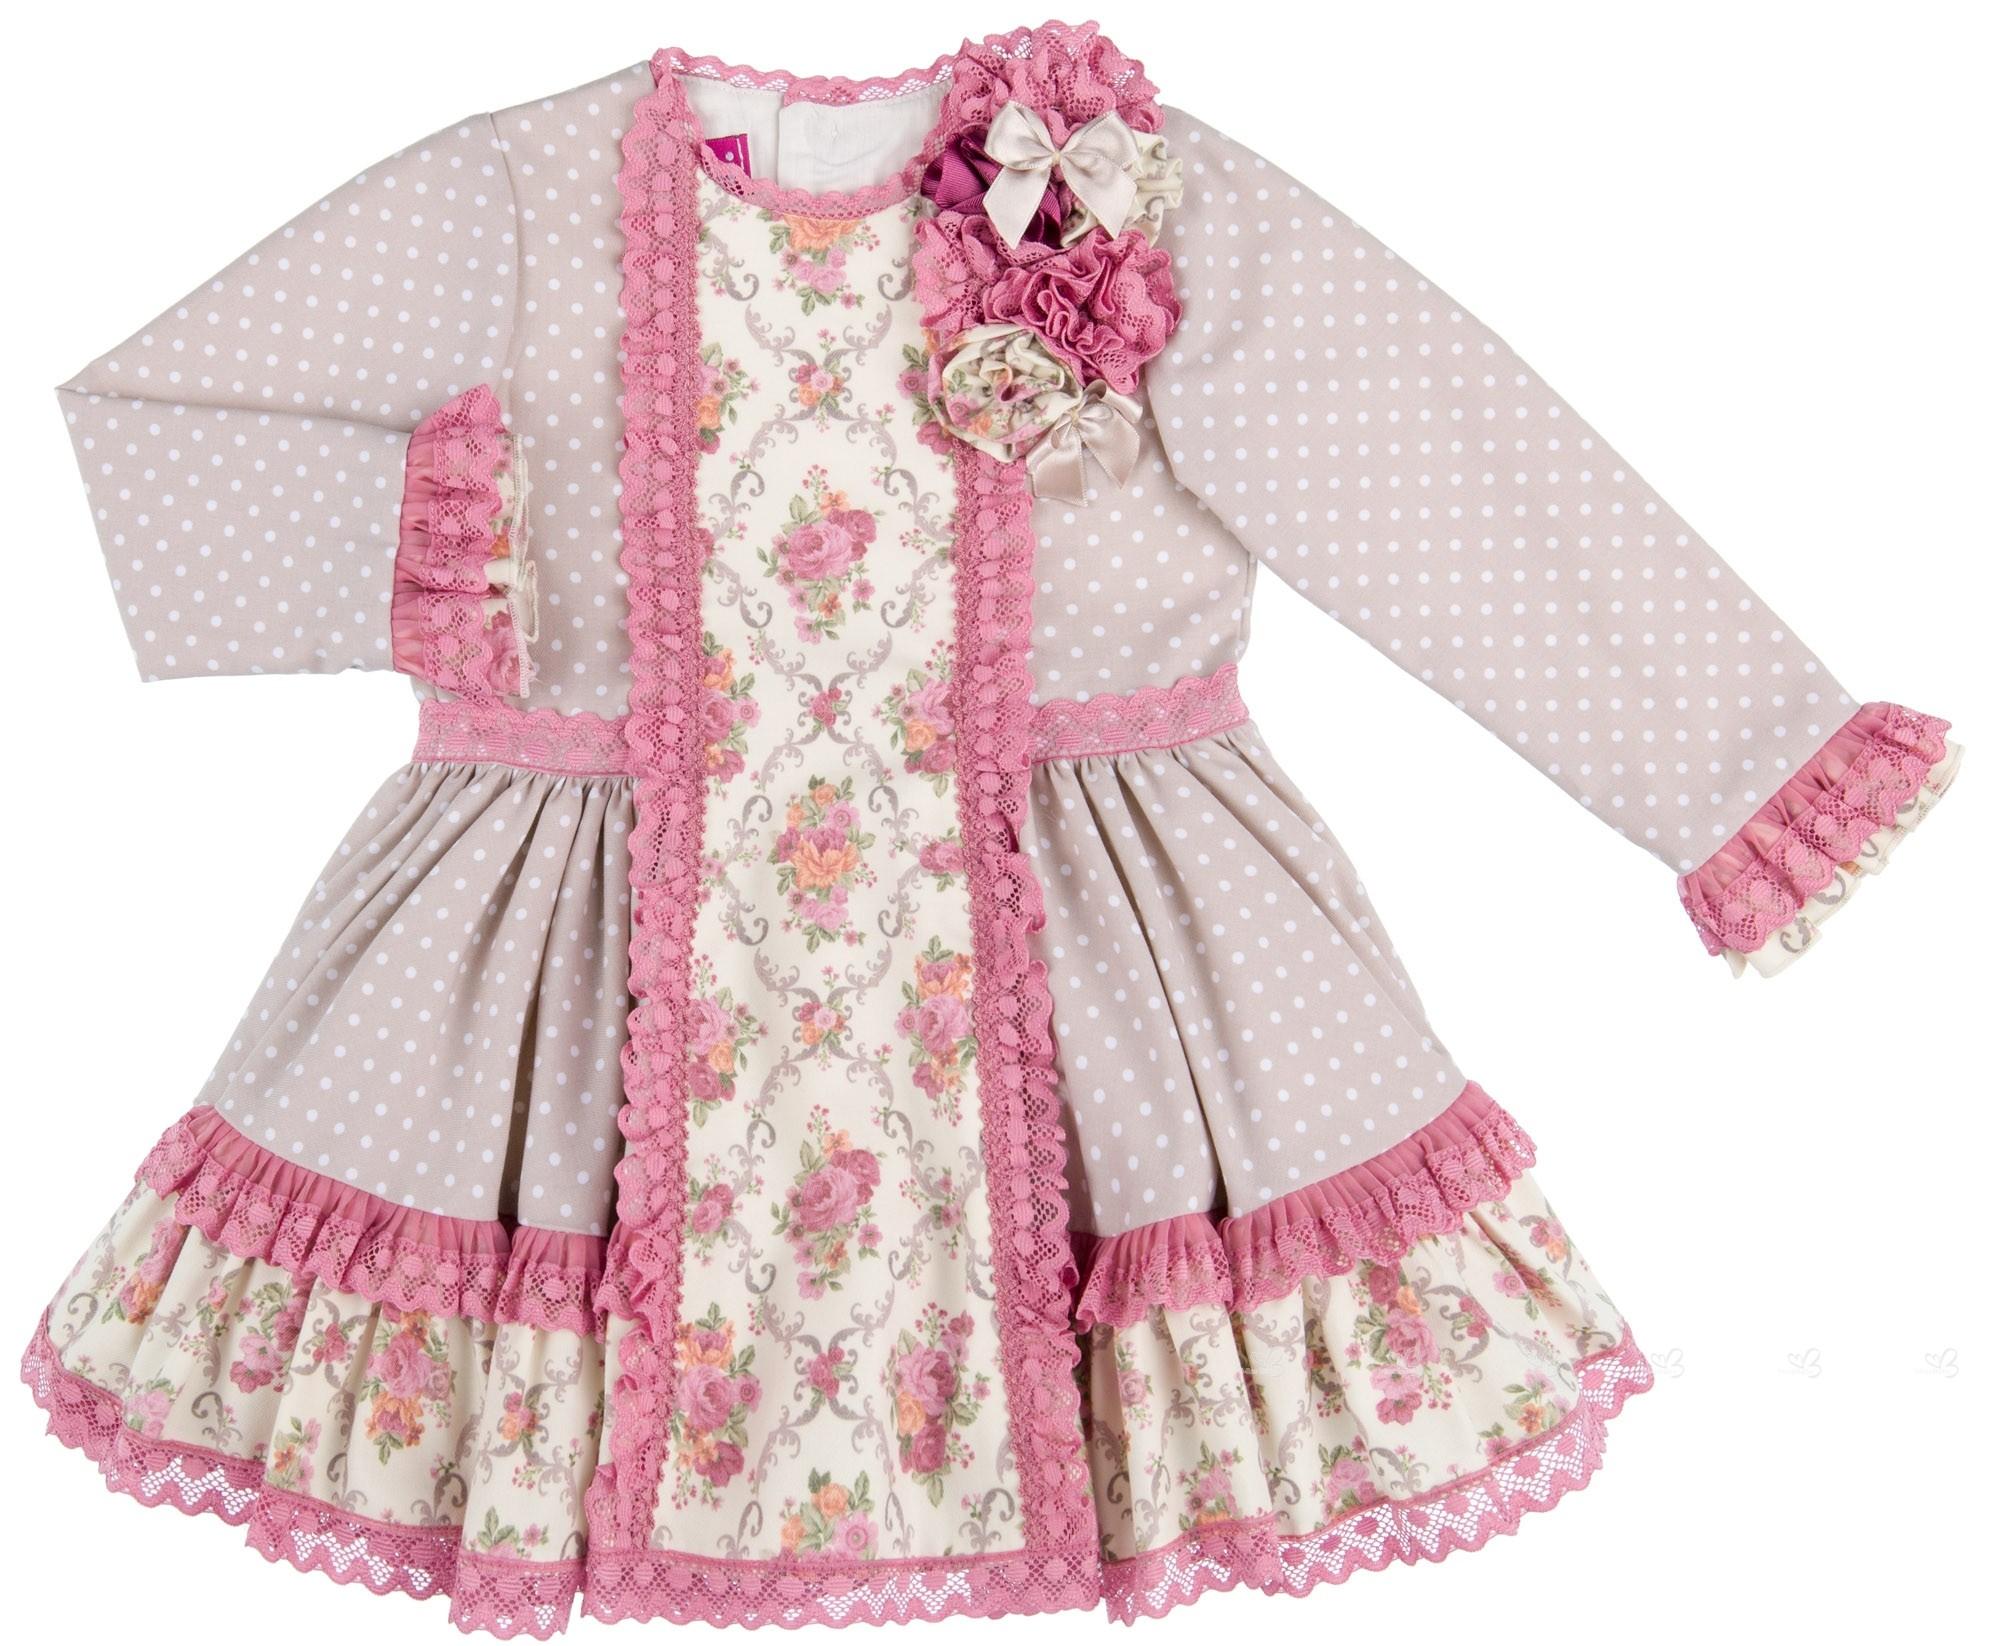 98551ea75 Girls Beige & Pink Flower Print Dress